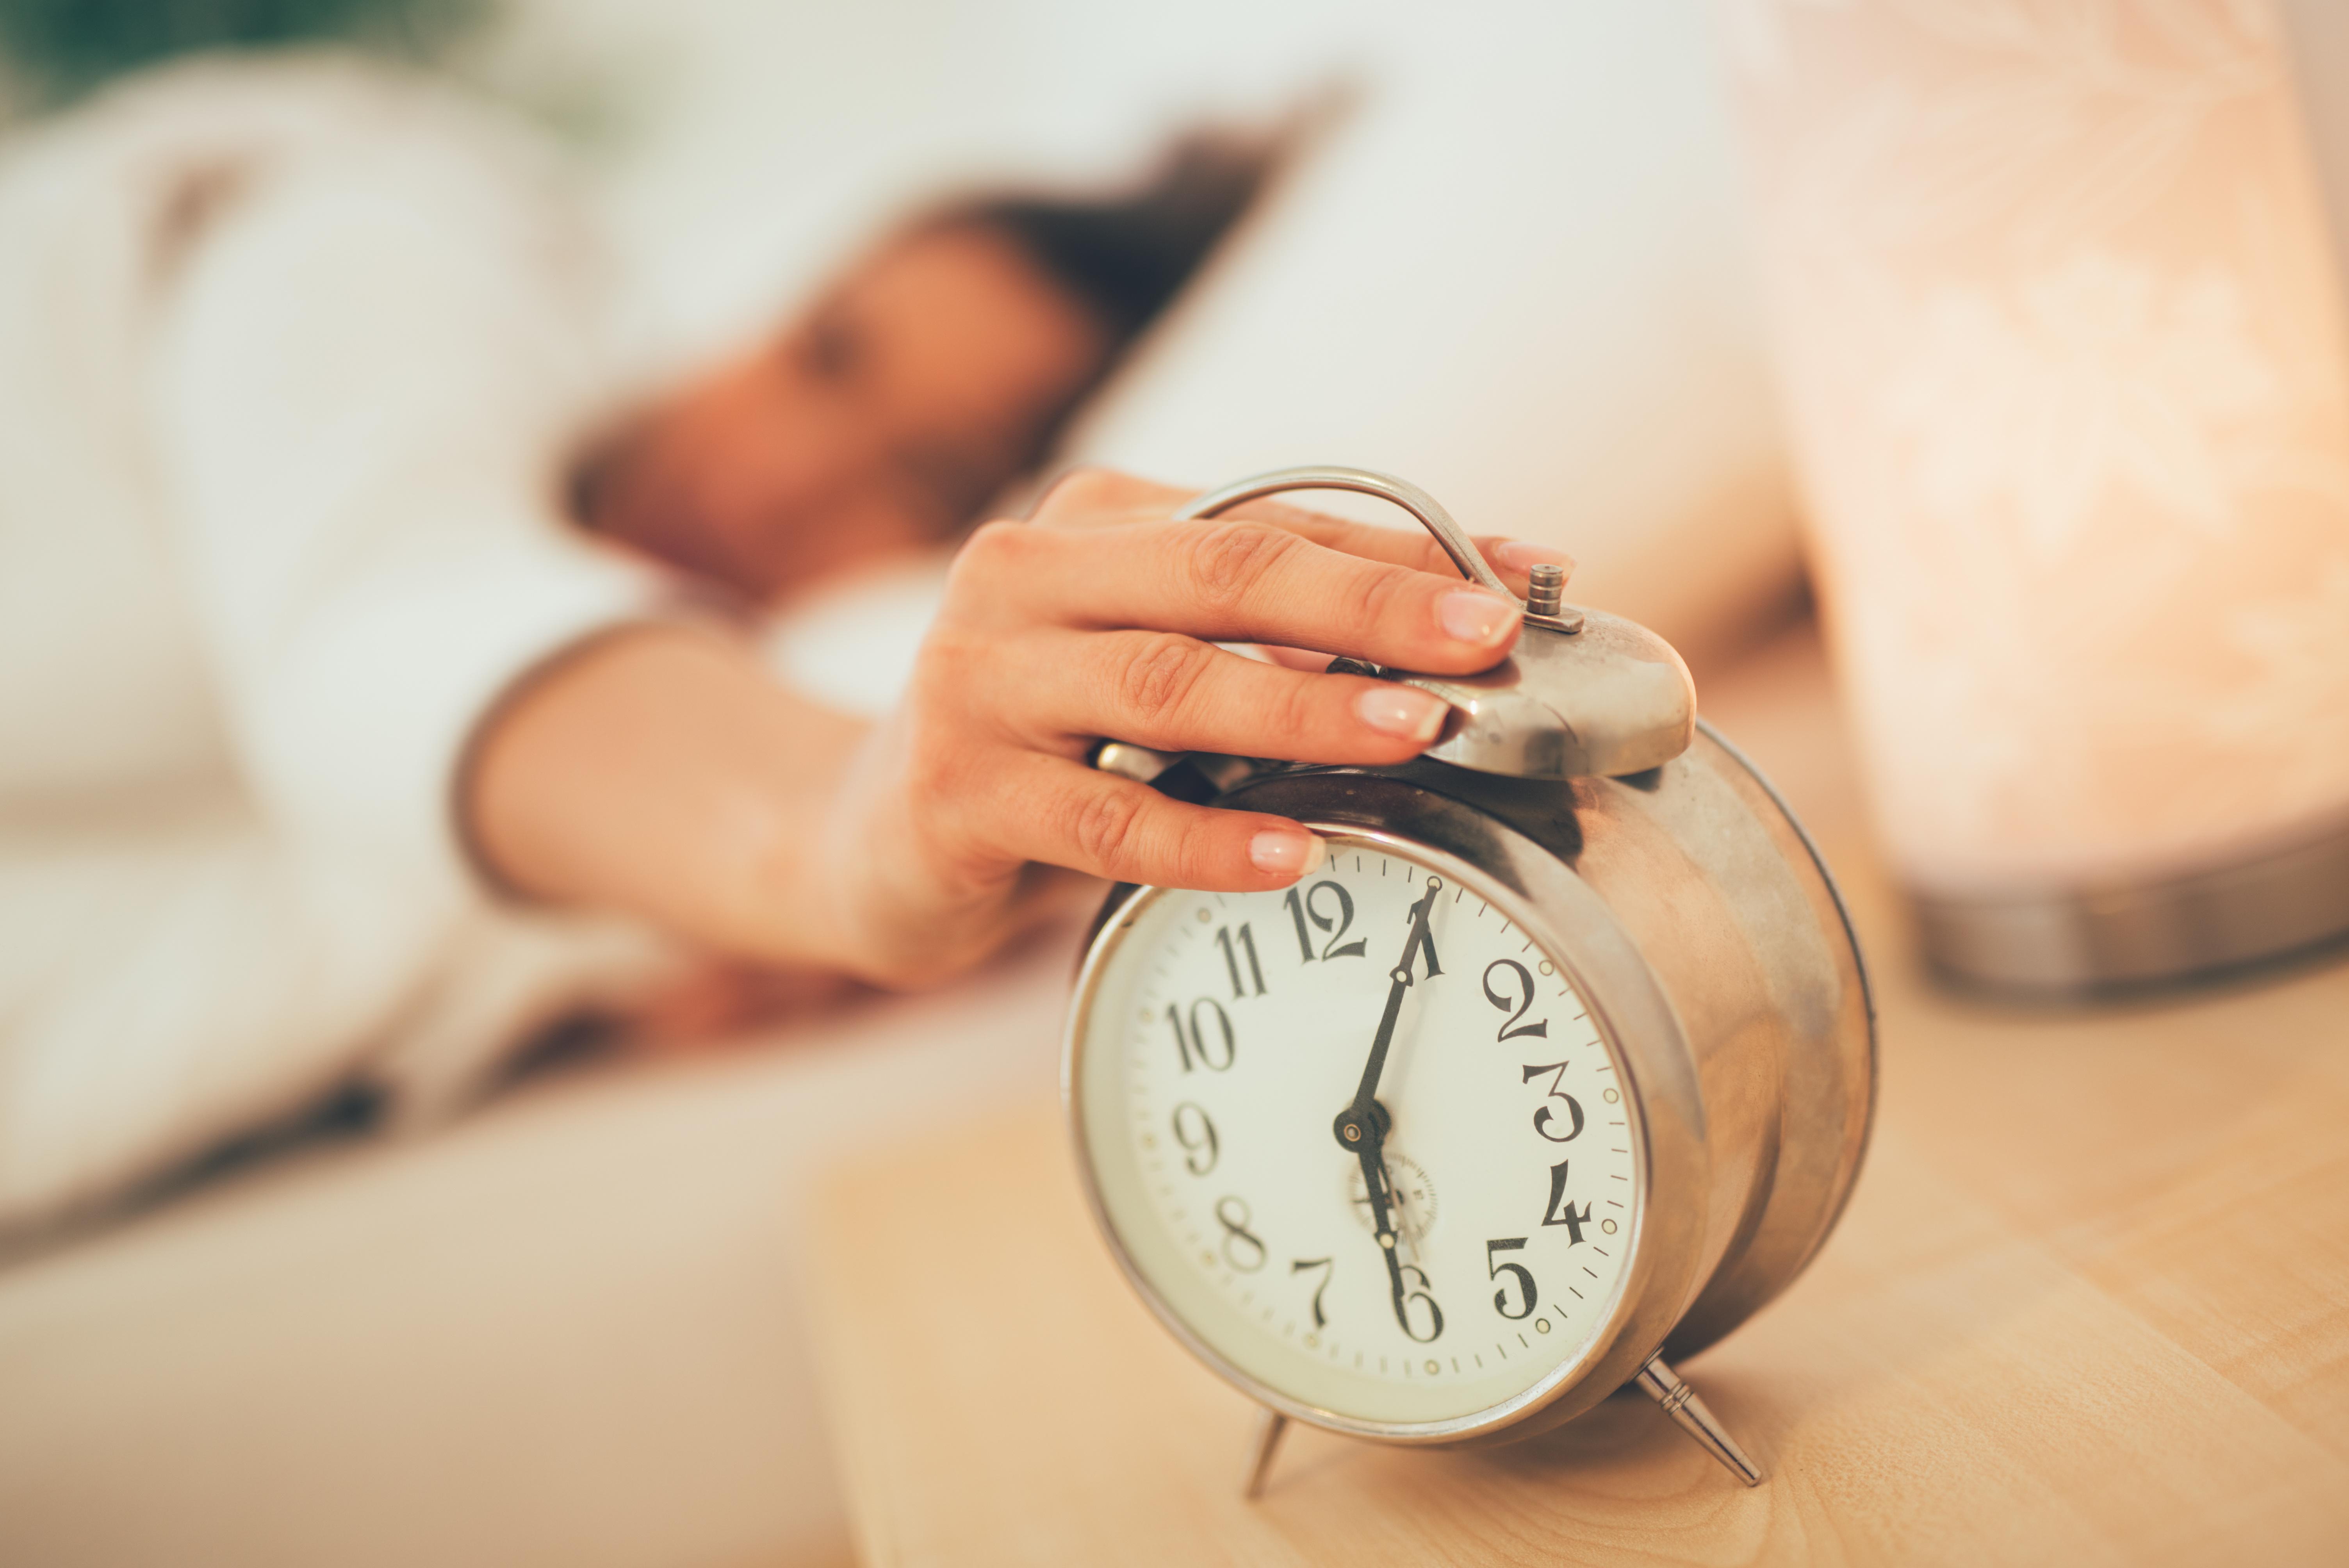 5 WAYS TO ACHIEVE A BETTER NIGHT'S SLEEP